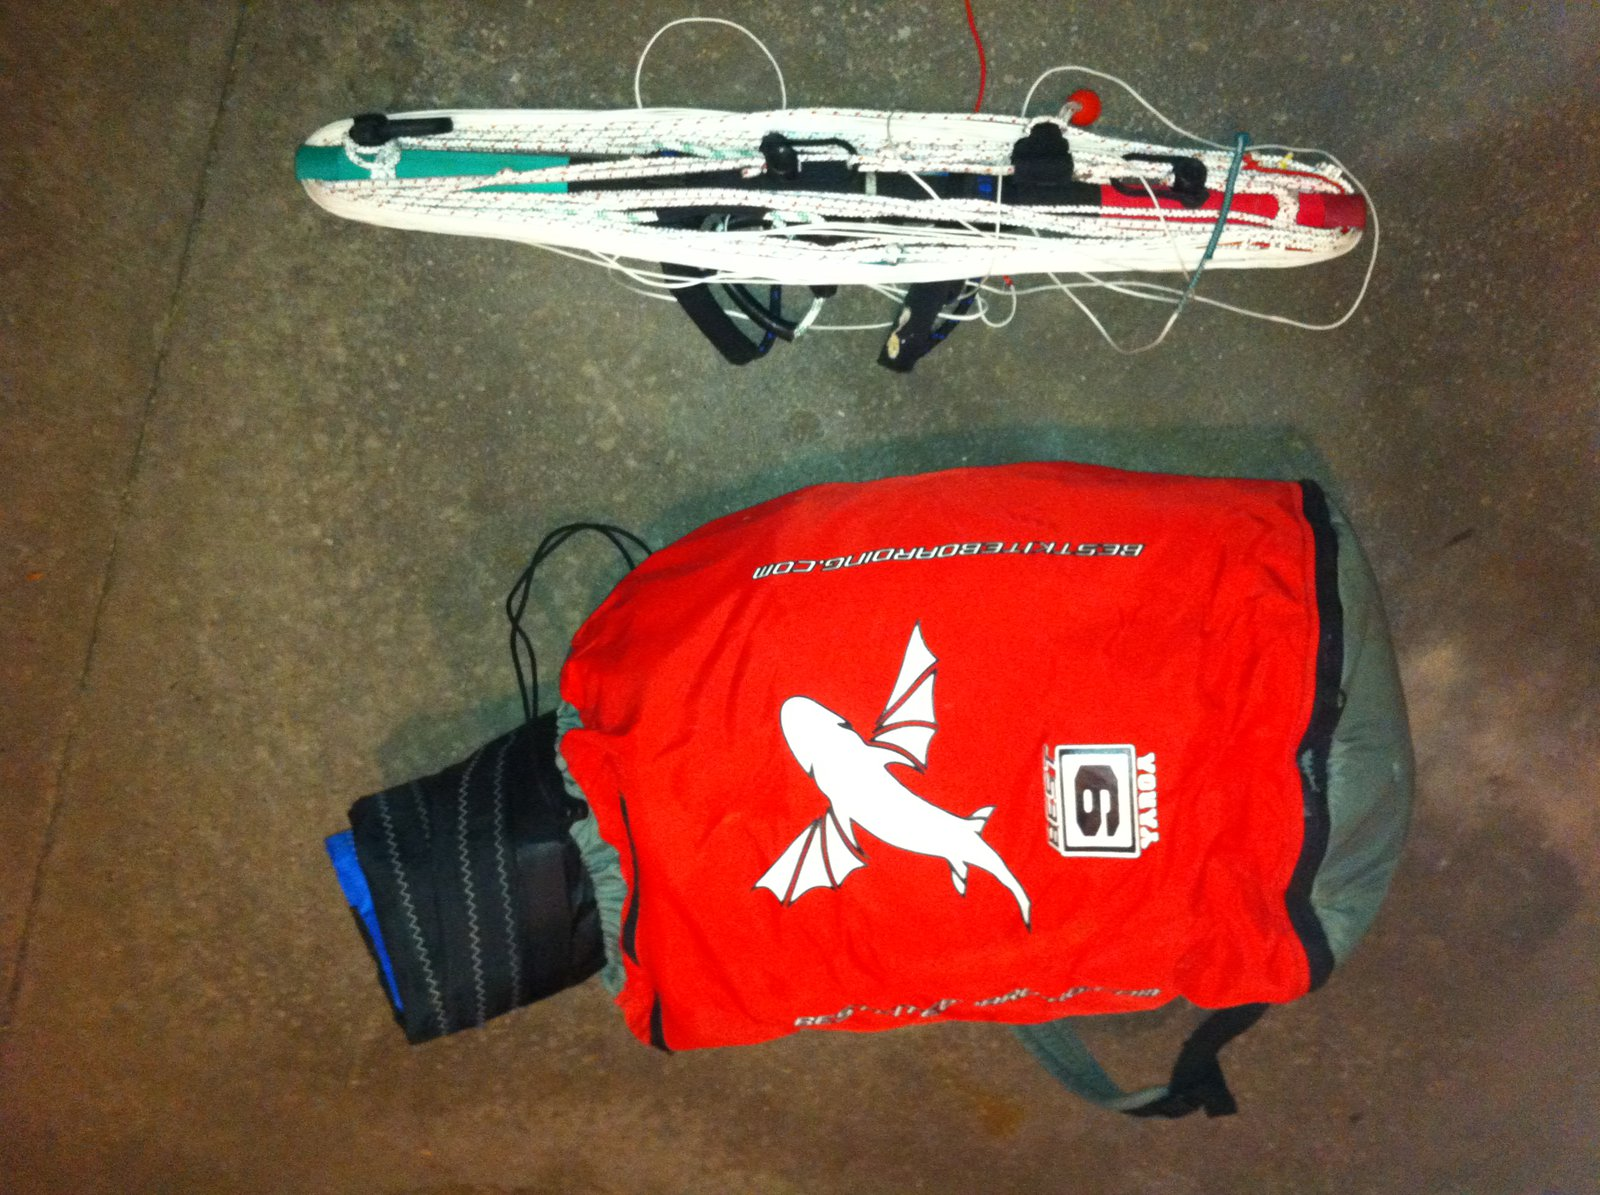 9m kiteboarding kite